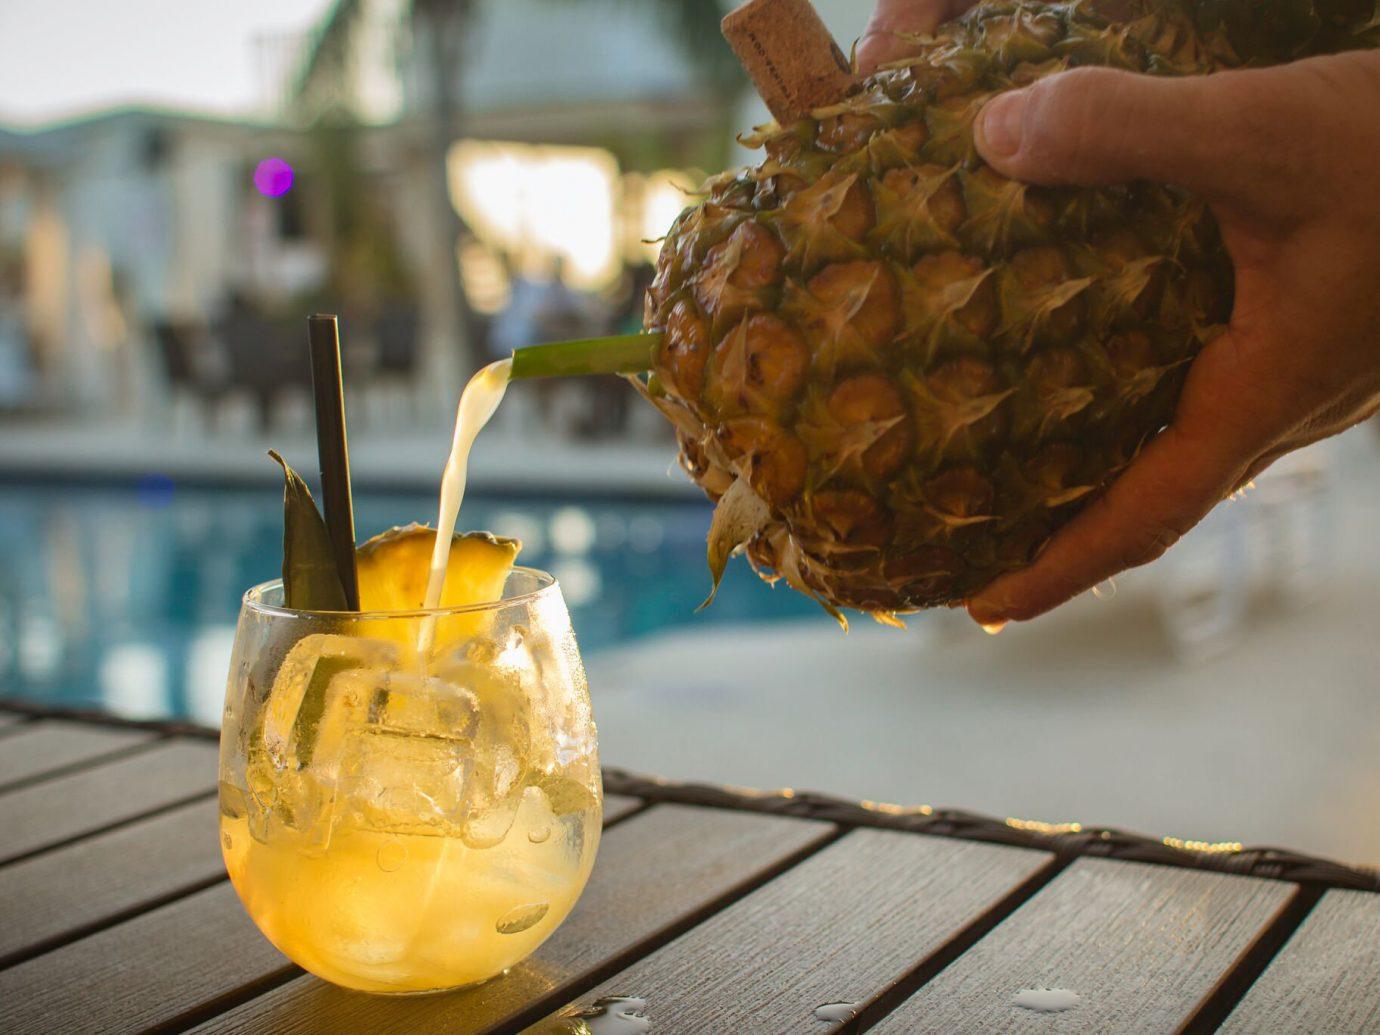 Trip Ideas food produce plant fruit land plant pineapple Drink flowering plant